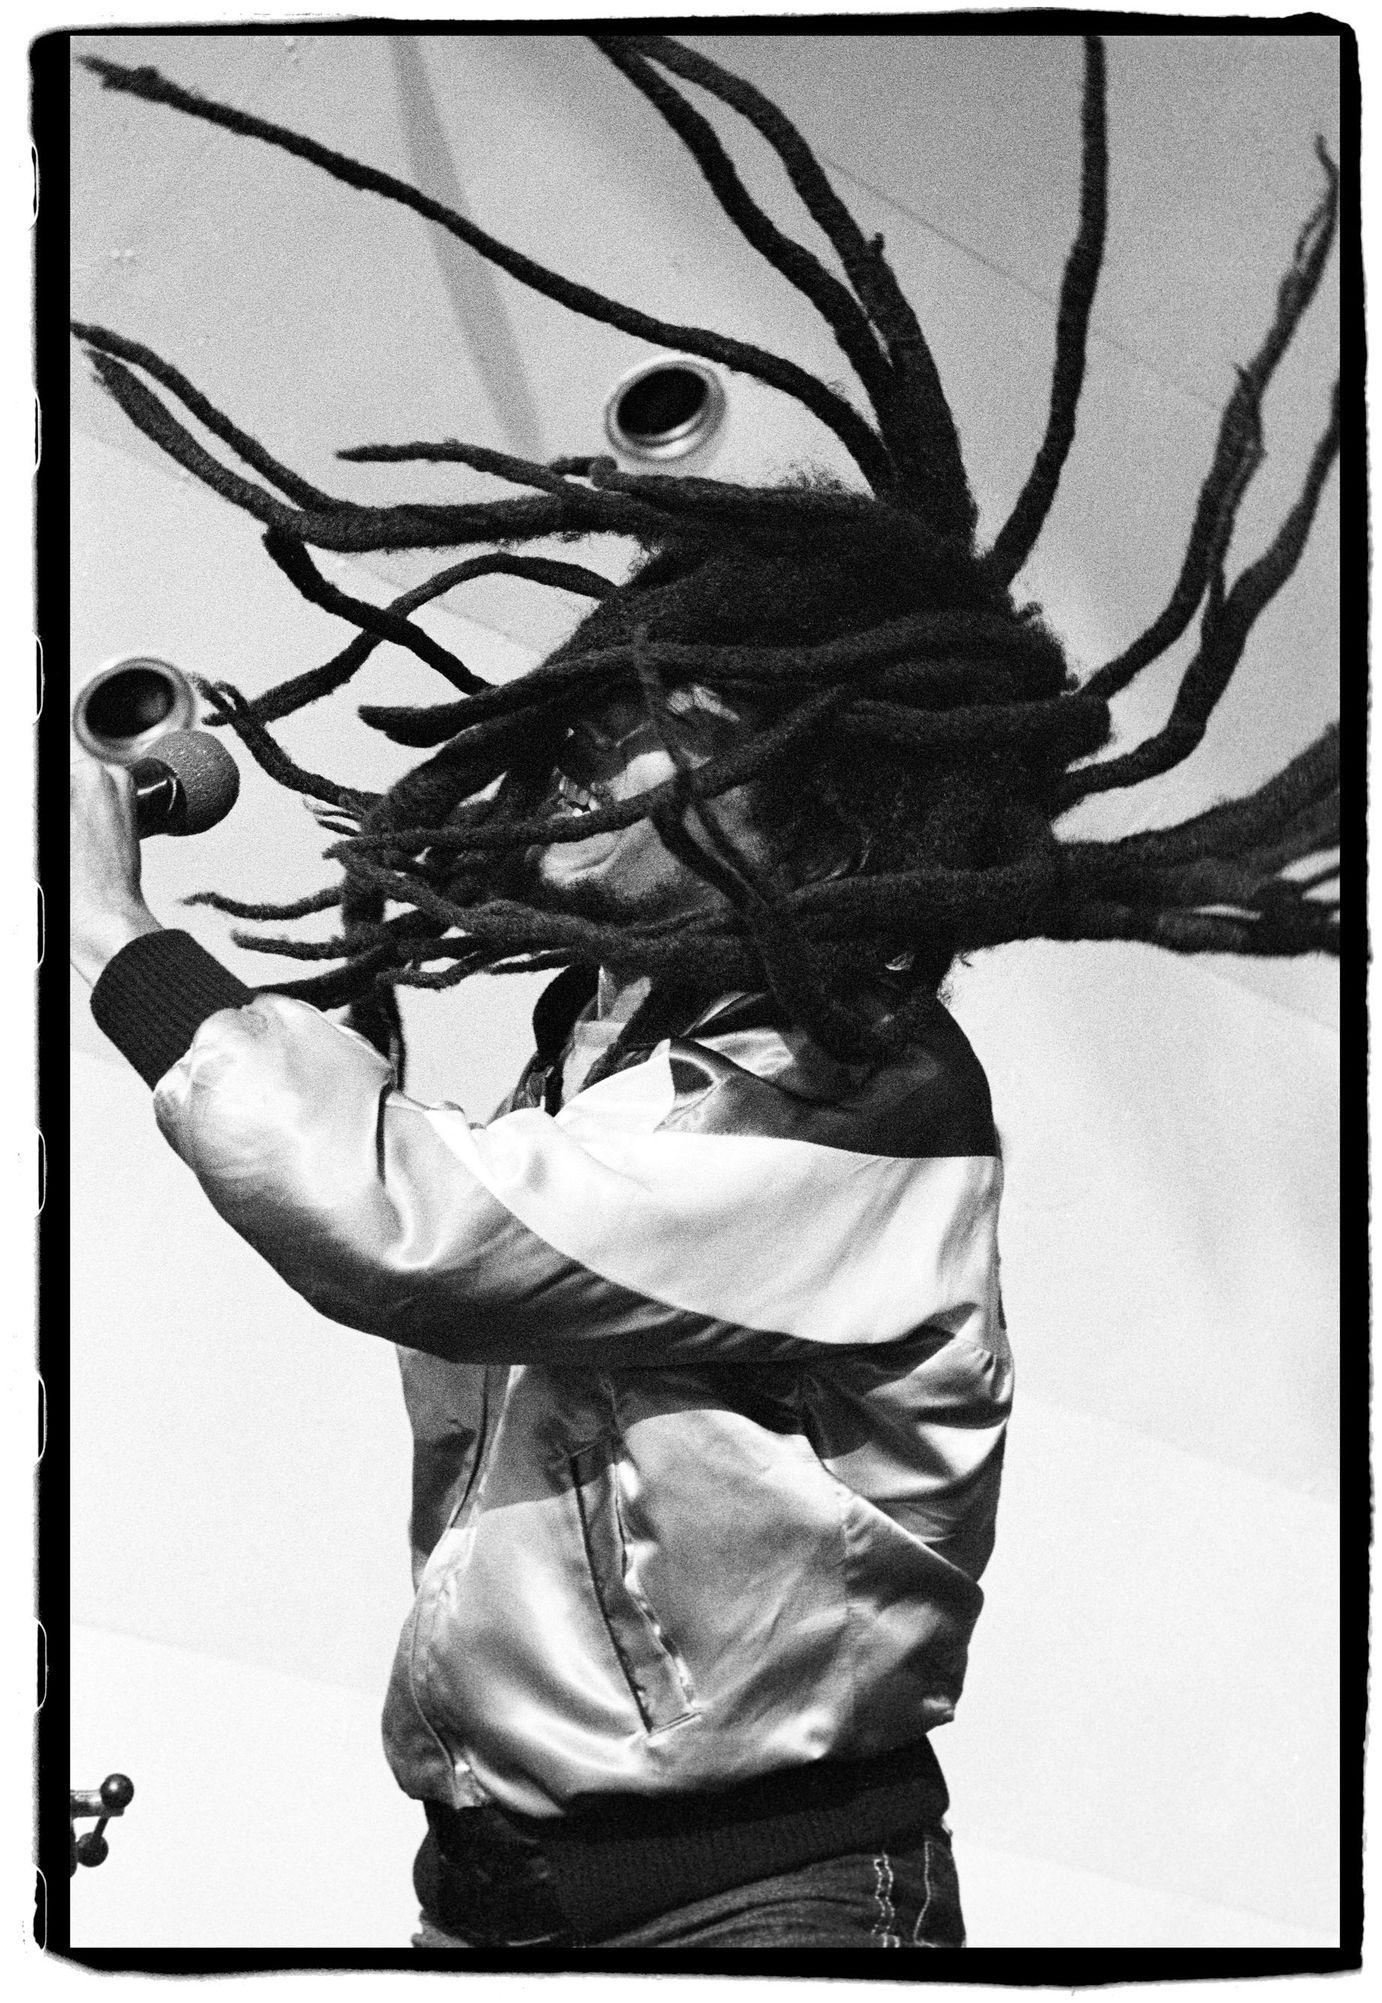 Bob Marley, Last London show, Crystal Palace Bowl, London, UK, 7th June 1980